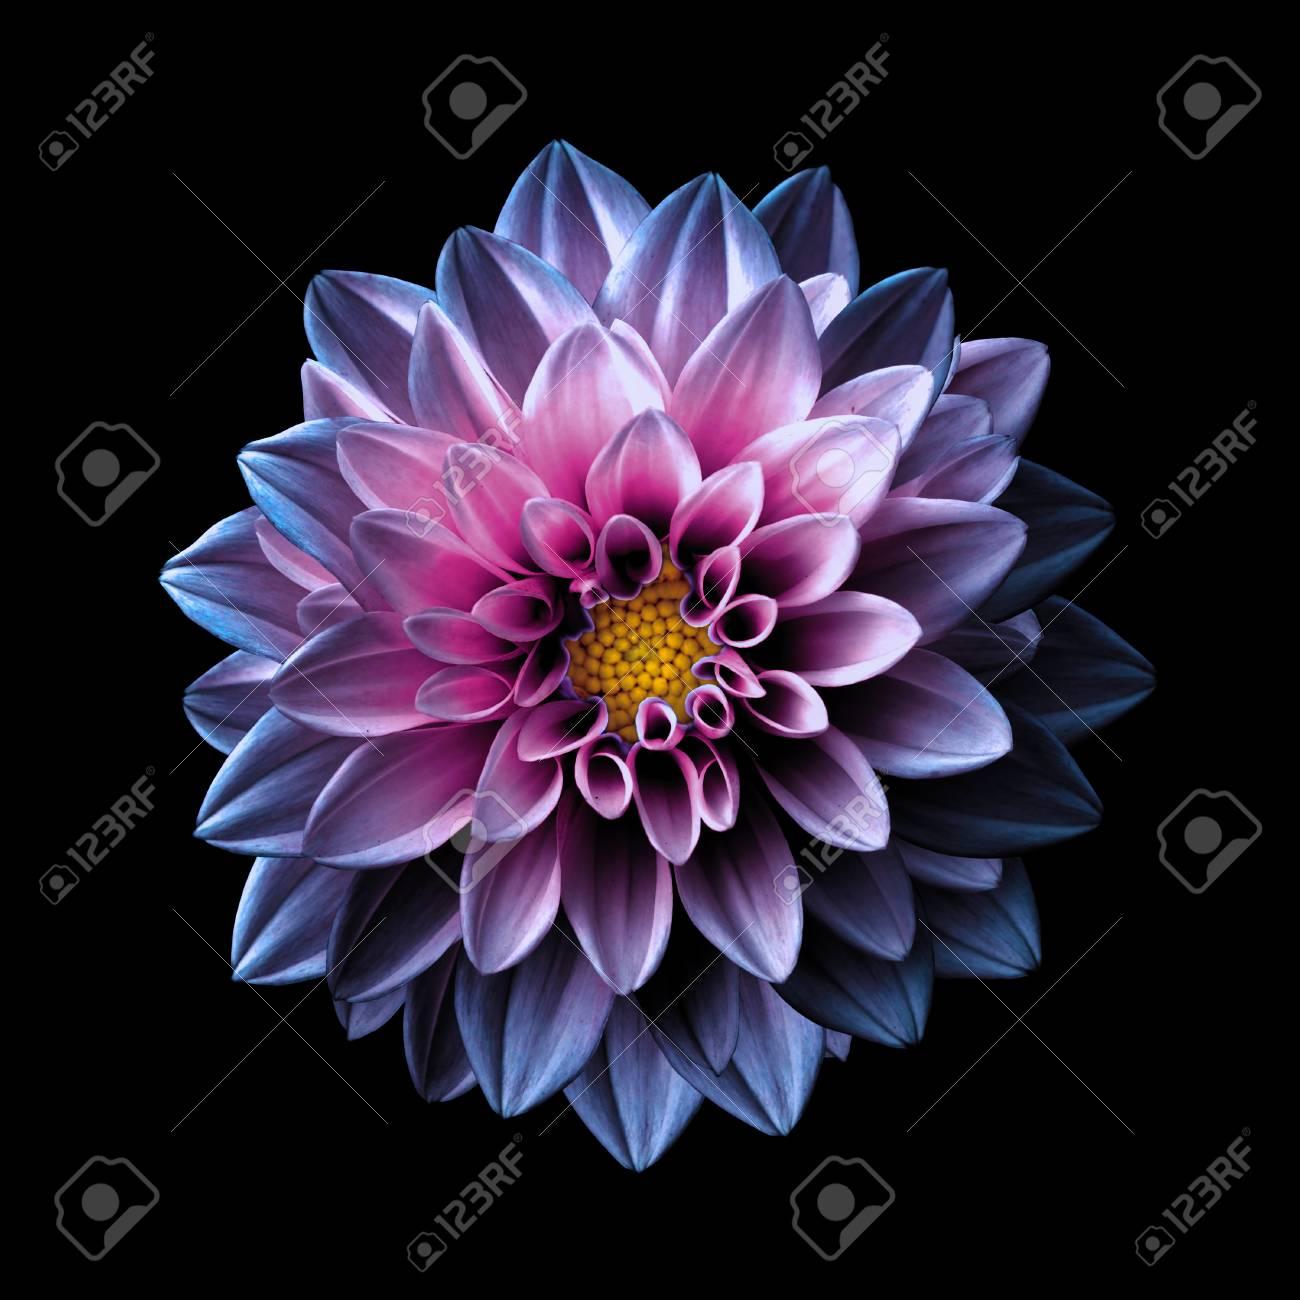 Surreal Dark Chrome Pink And Purple Flower Dahlia Macro Isolated